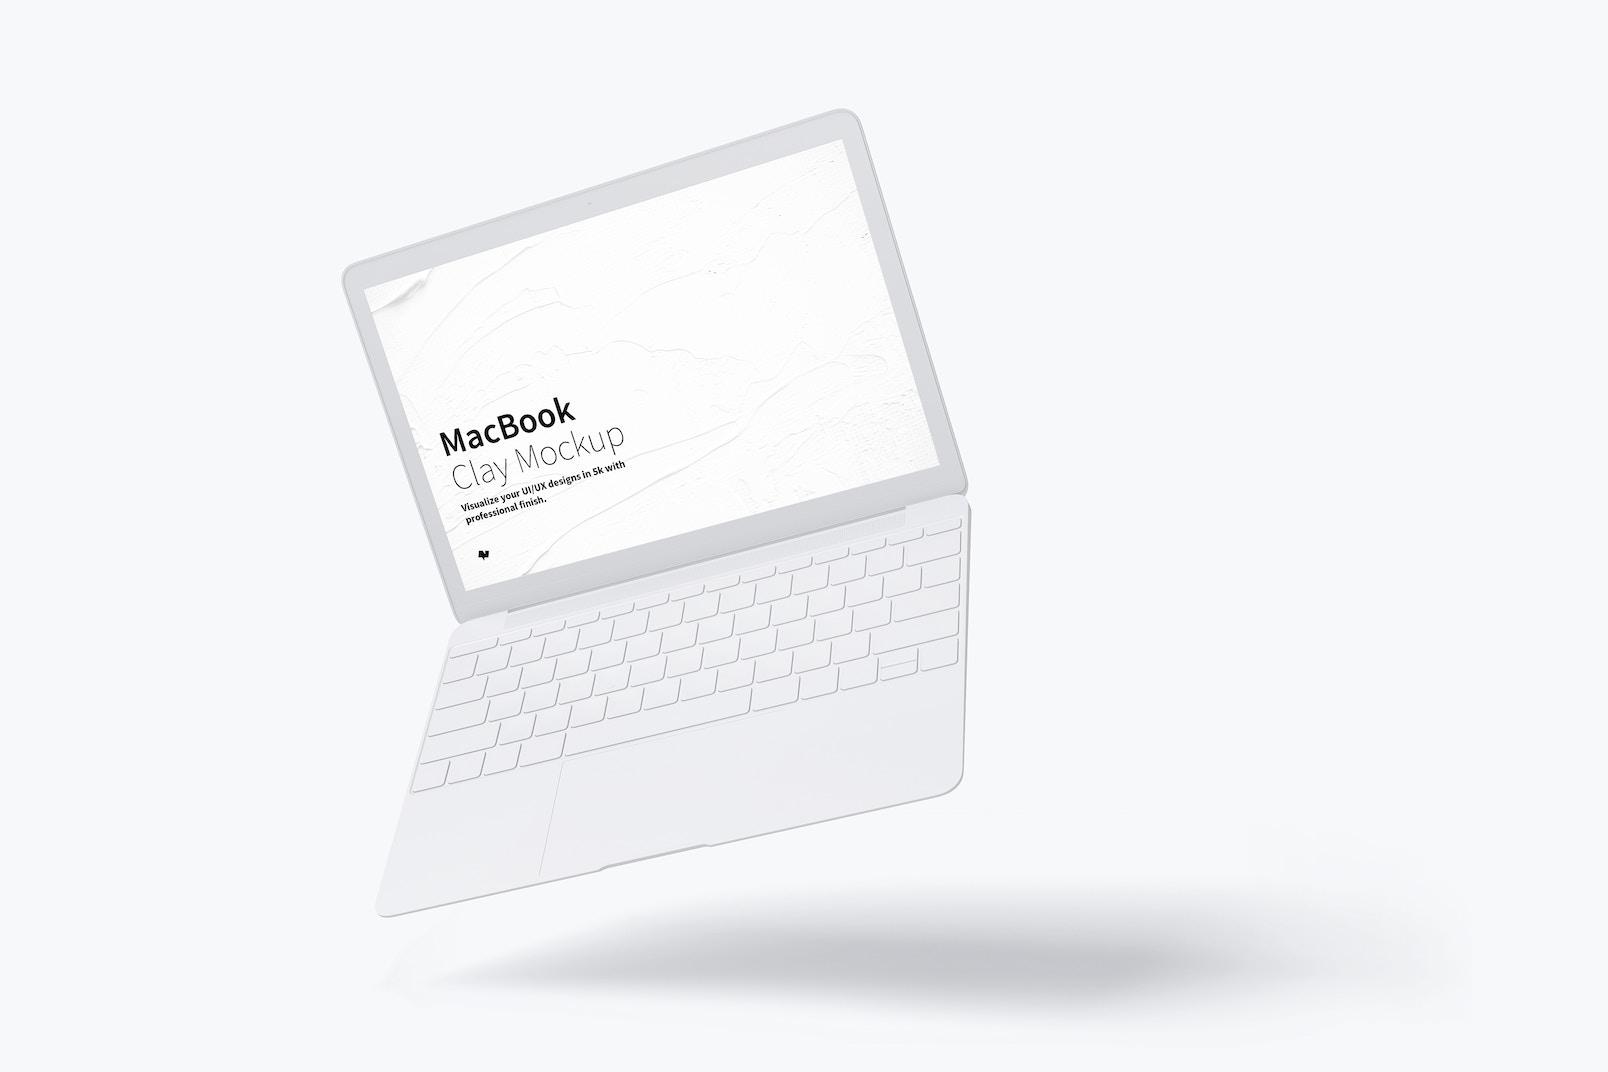 Clay MacBook Mockup, Floating